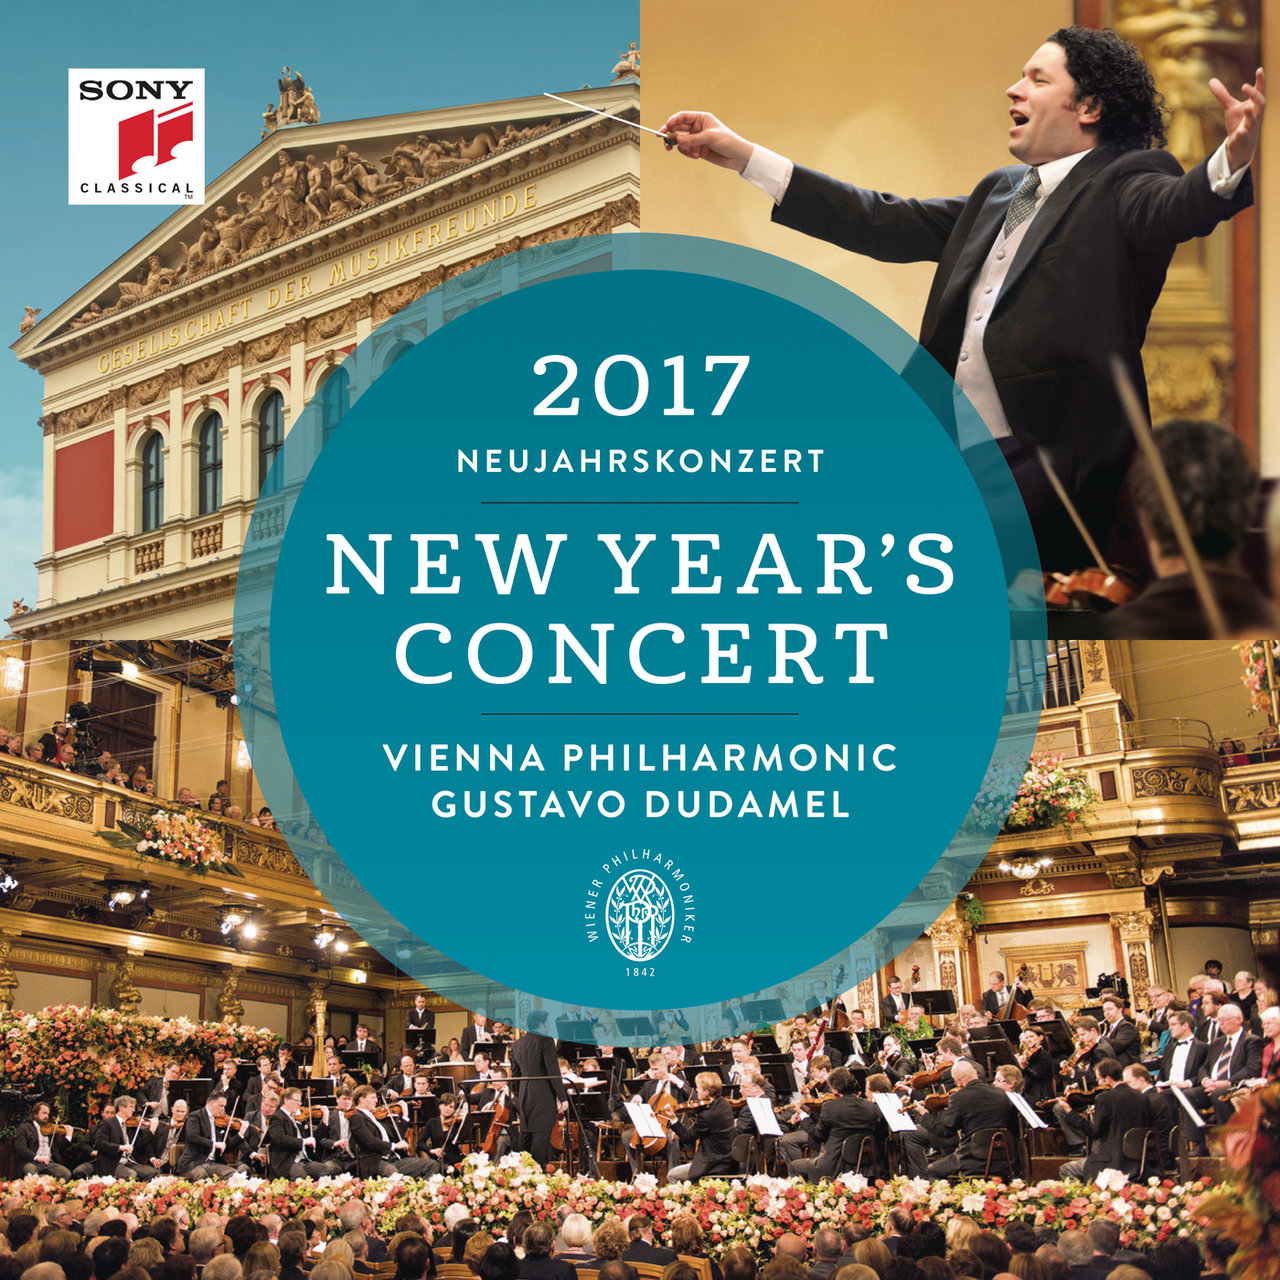 New year's concert 2017 / neujahrskonzert 2017 / gustavo dudamel tidal